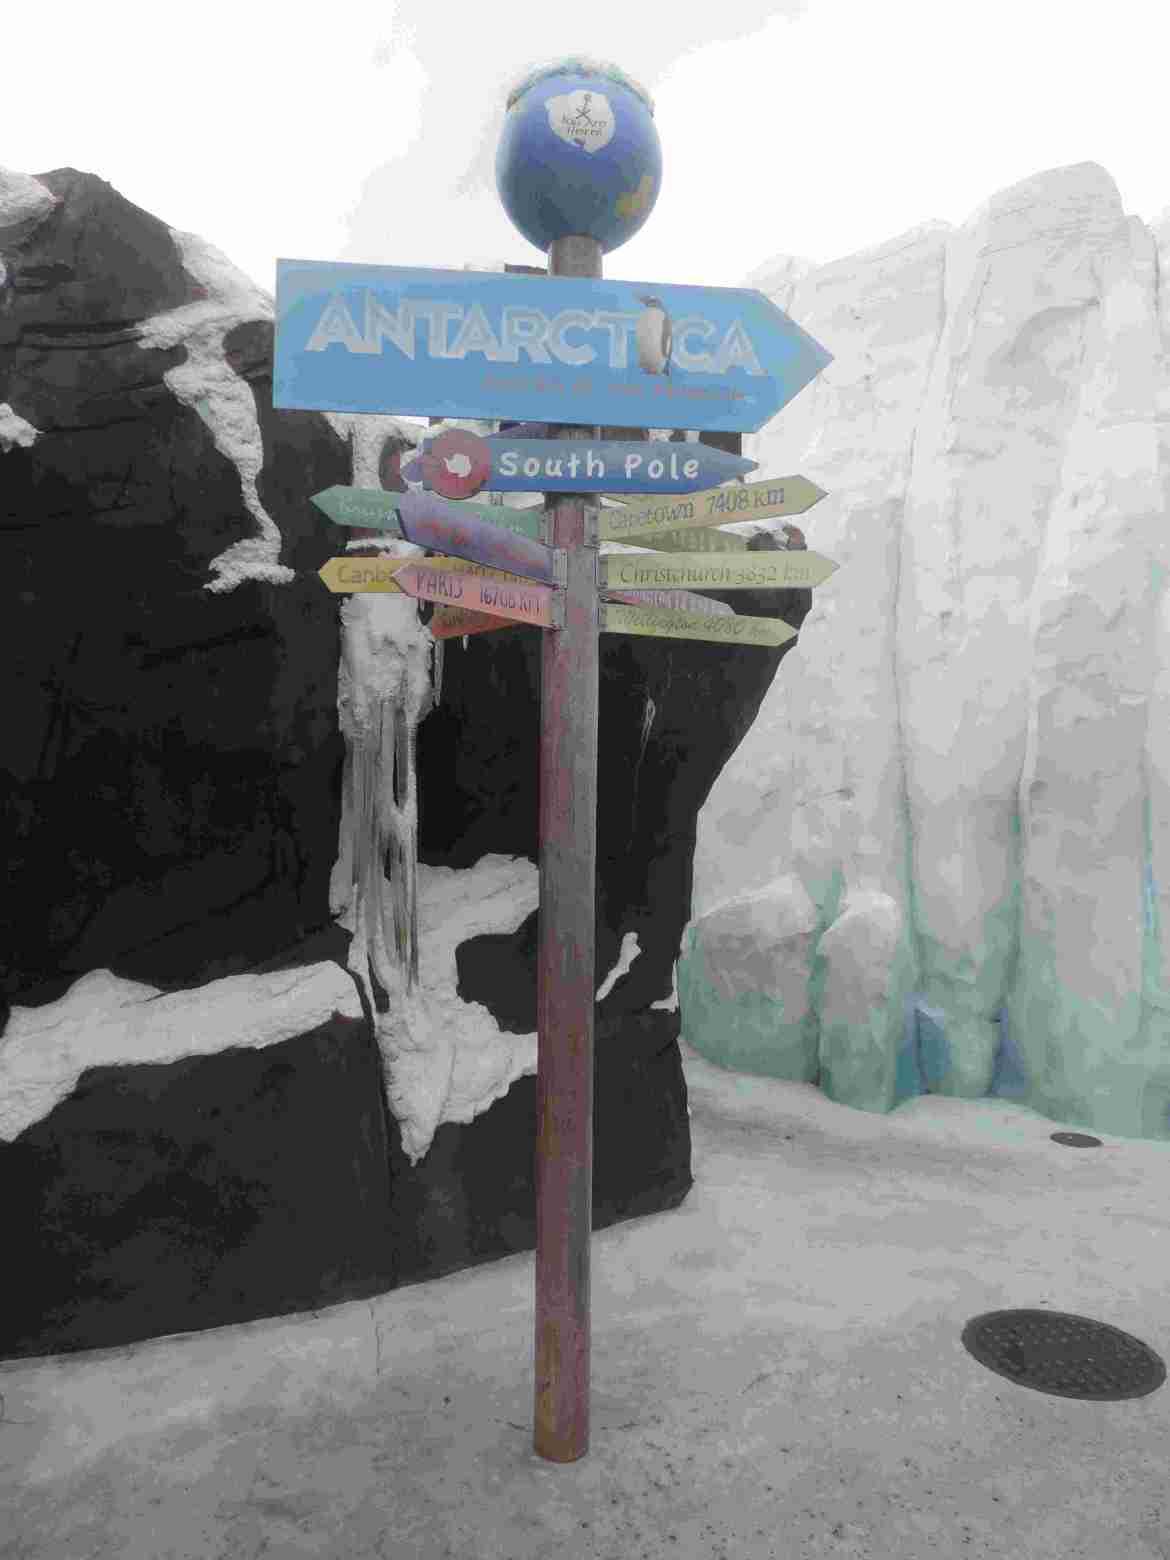 Antartica - Seaworld